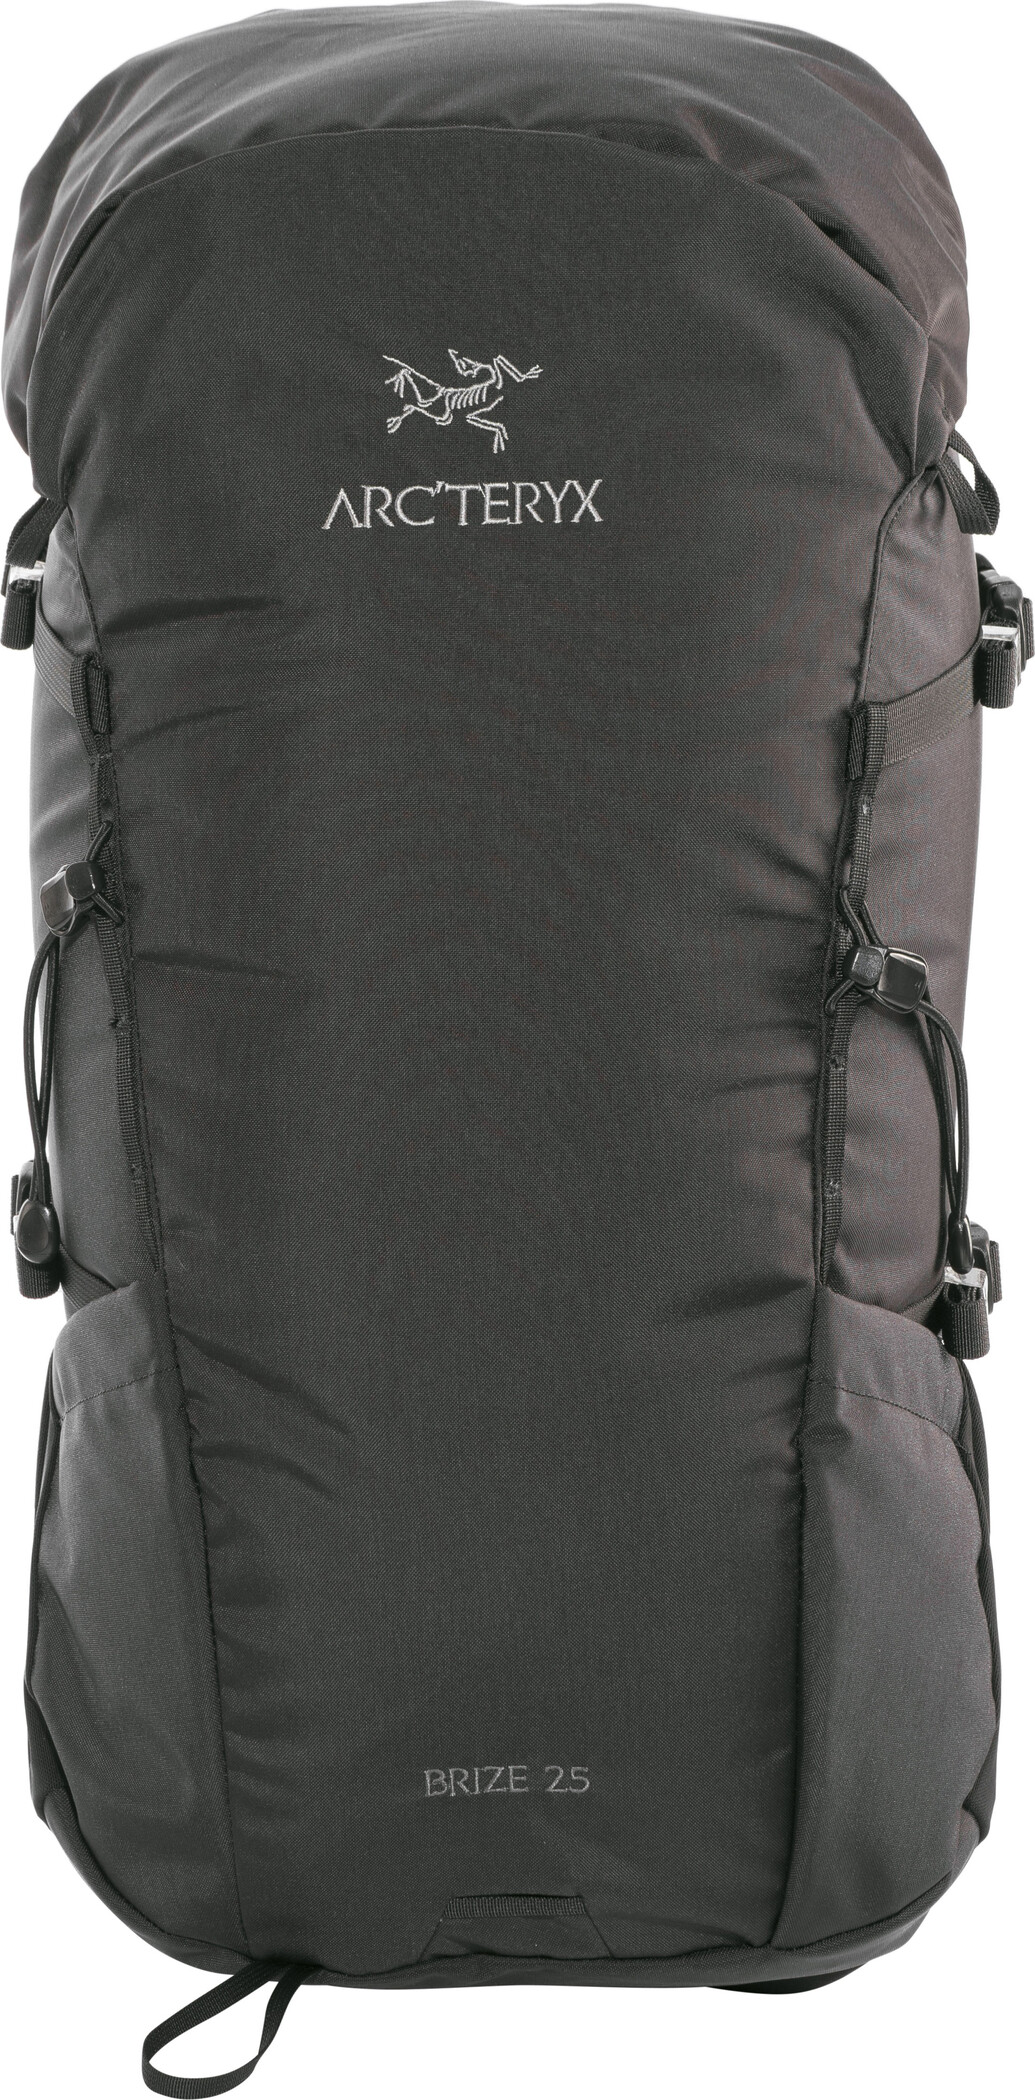 Arc'teryx Brize 25 Rygsæk, black (2019)   Travel bags